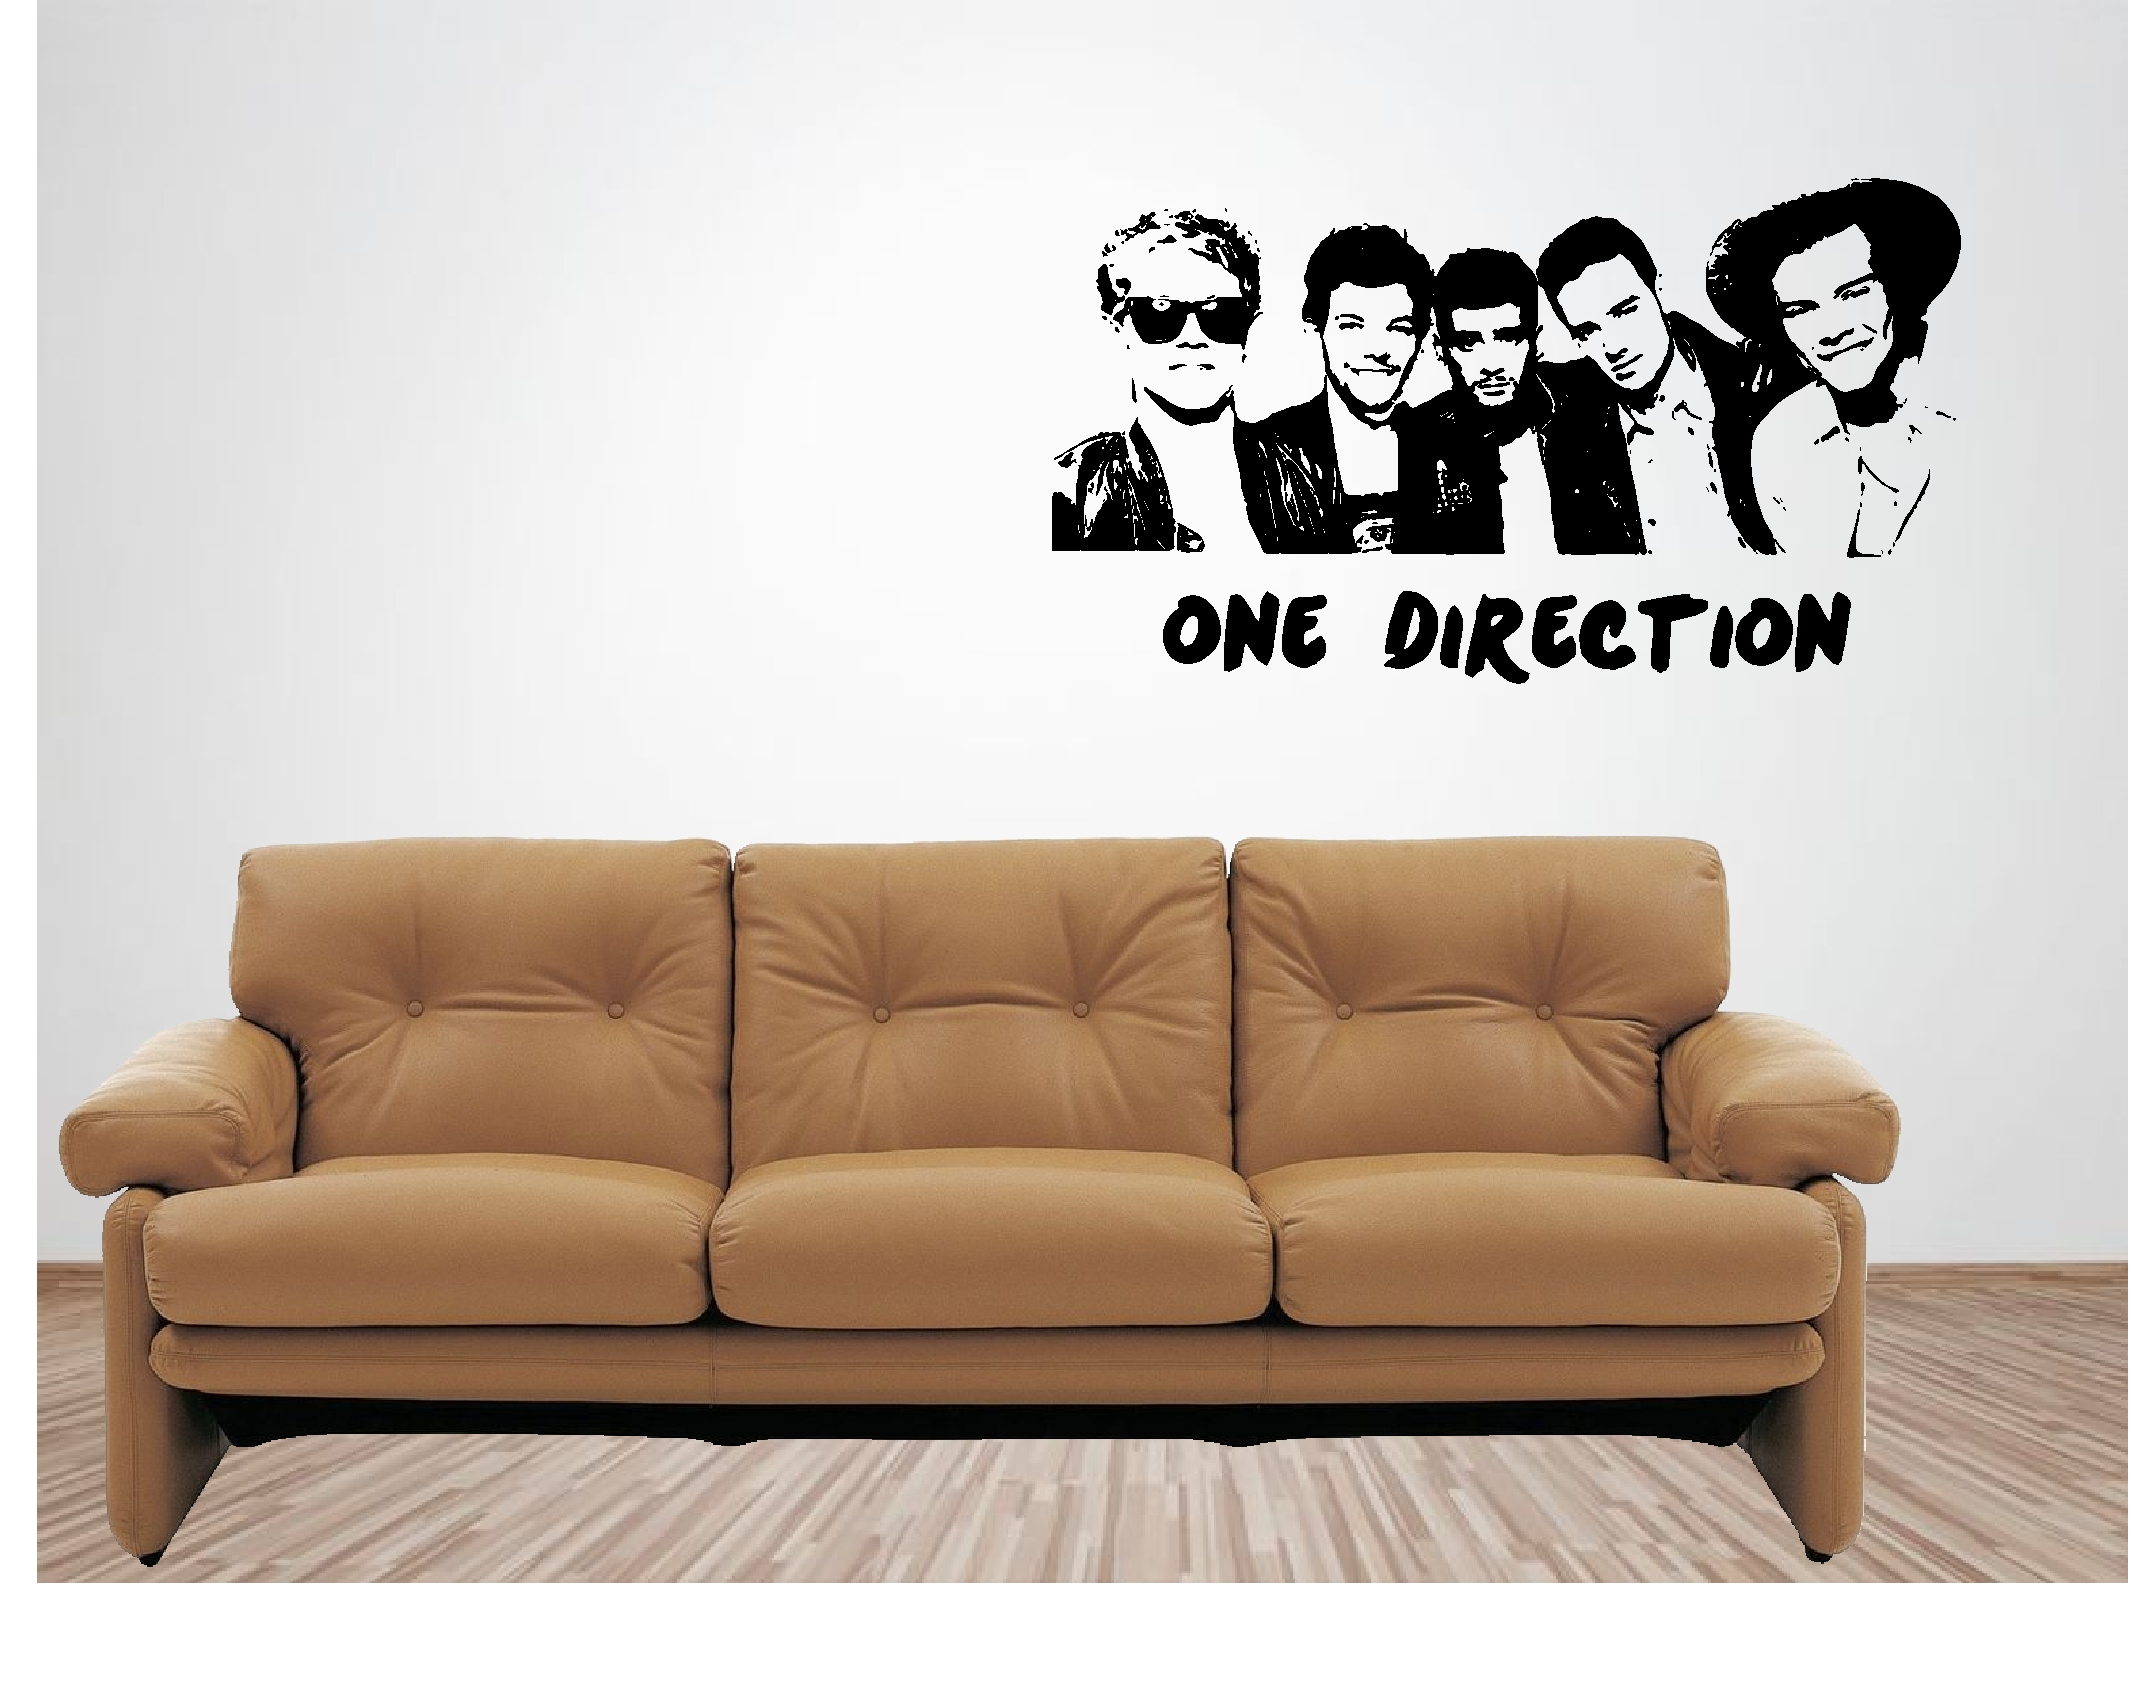 one direction vinyl wall art quote sticker music singer musical 1d ebay. Black Bedroom Furniture Sets. Home Design Ideas